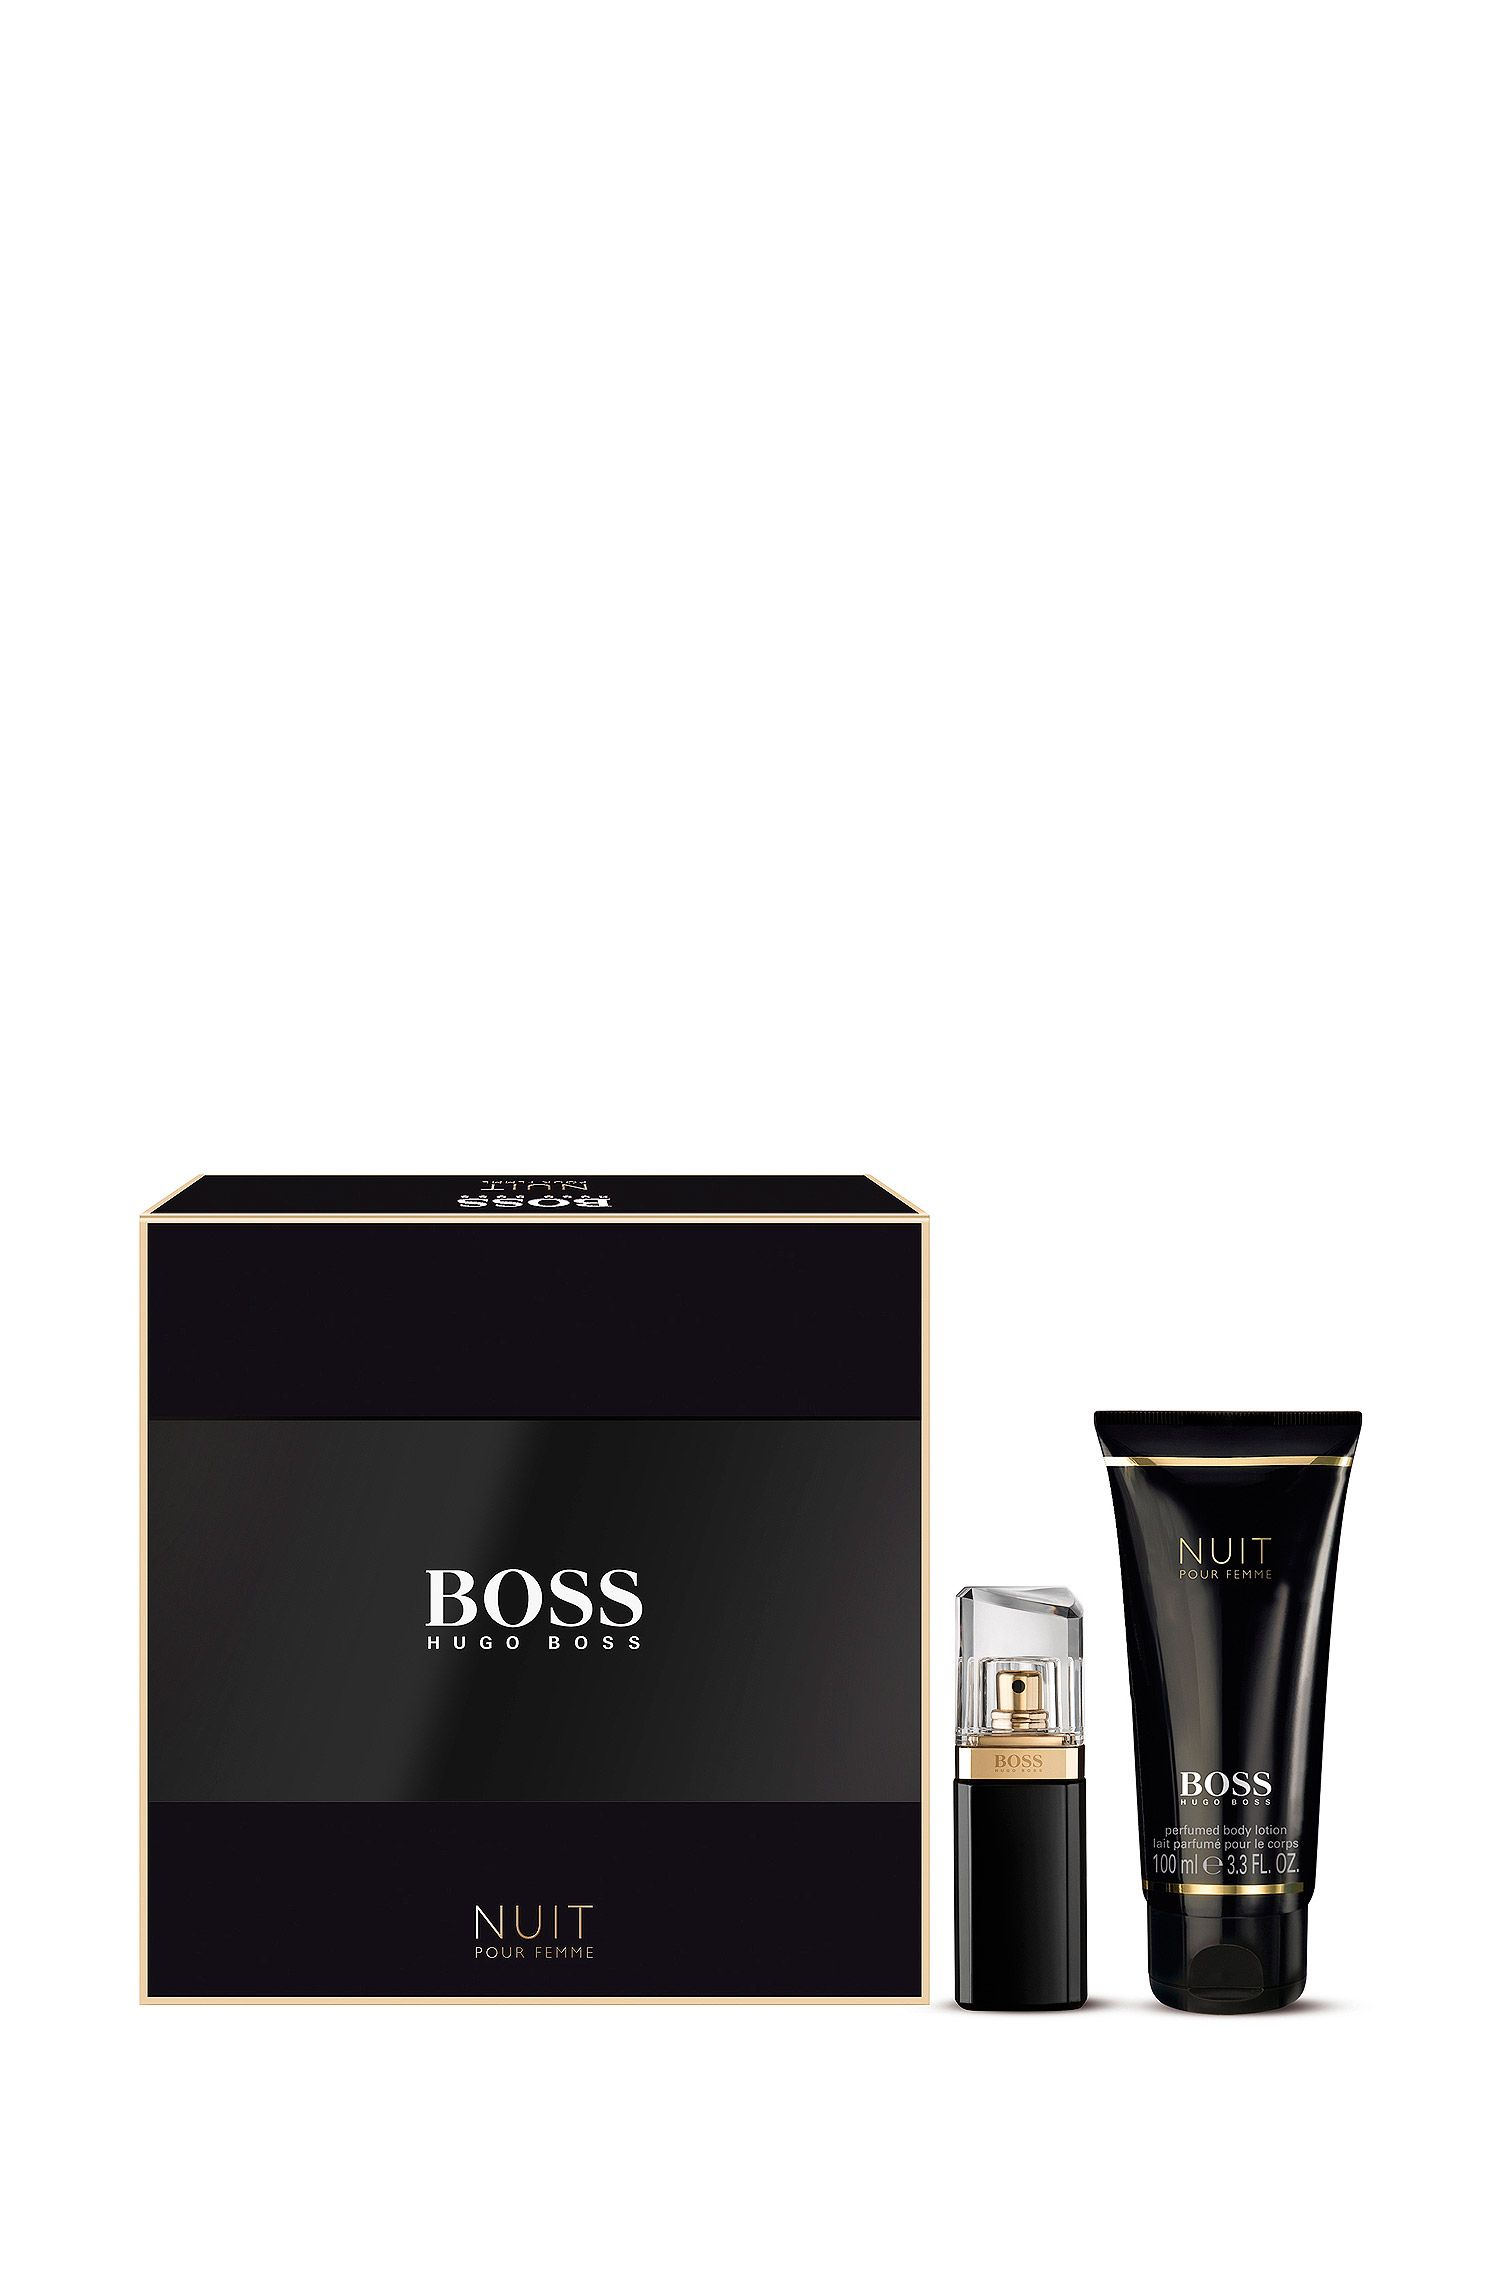 BOSS Nuit Geschenkset mit Eau de Parfum und Bodylotion